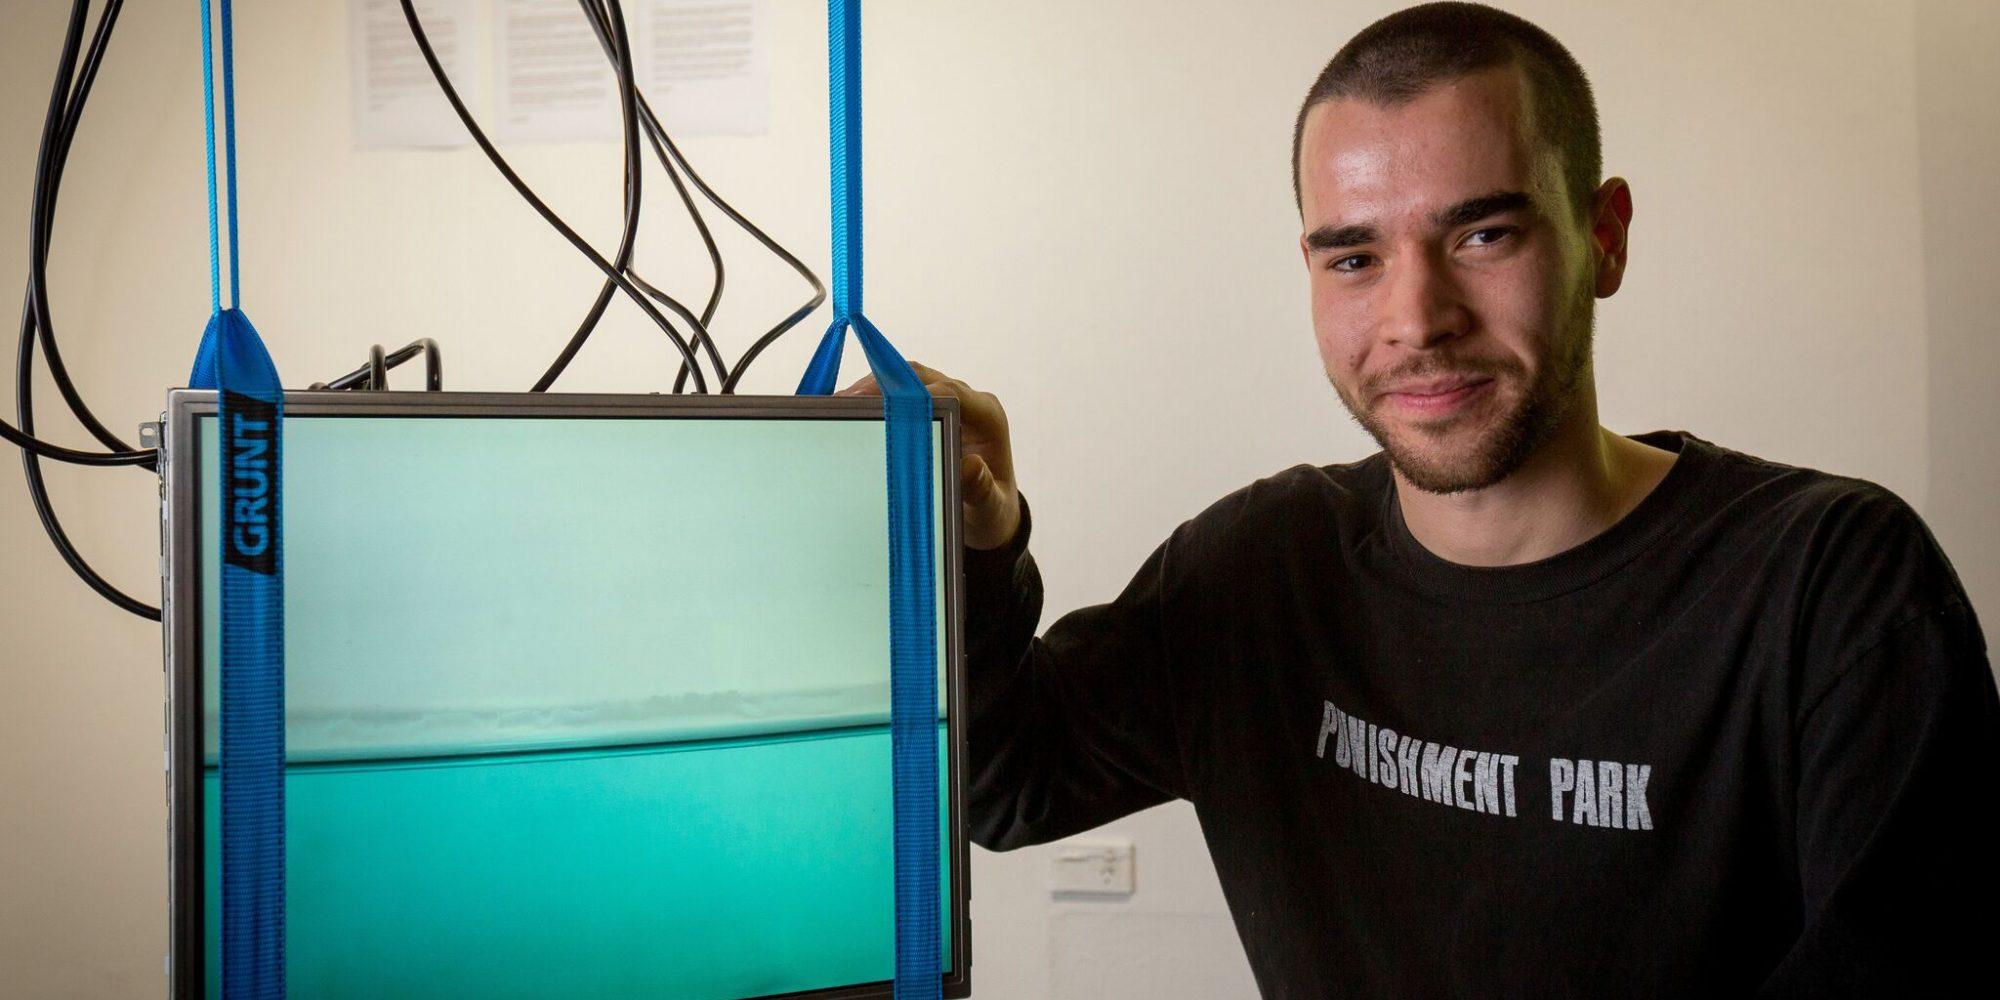 Trent Crawford with his video installation work Liquidity. Photo: Sav Schulman.